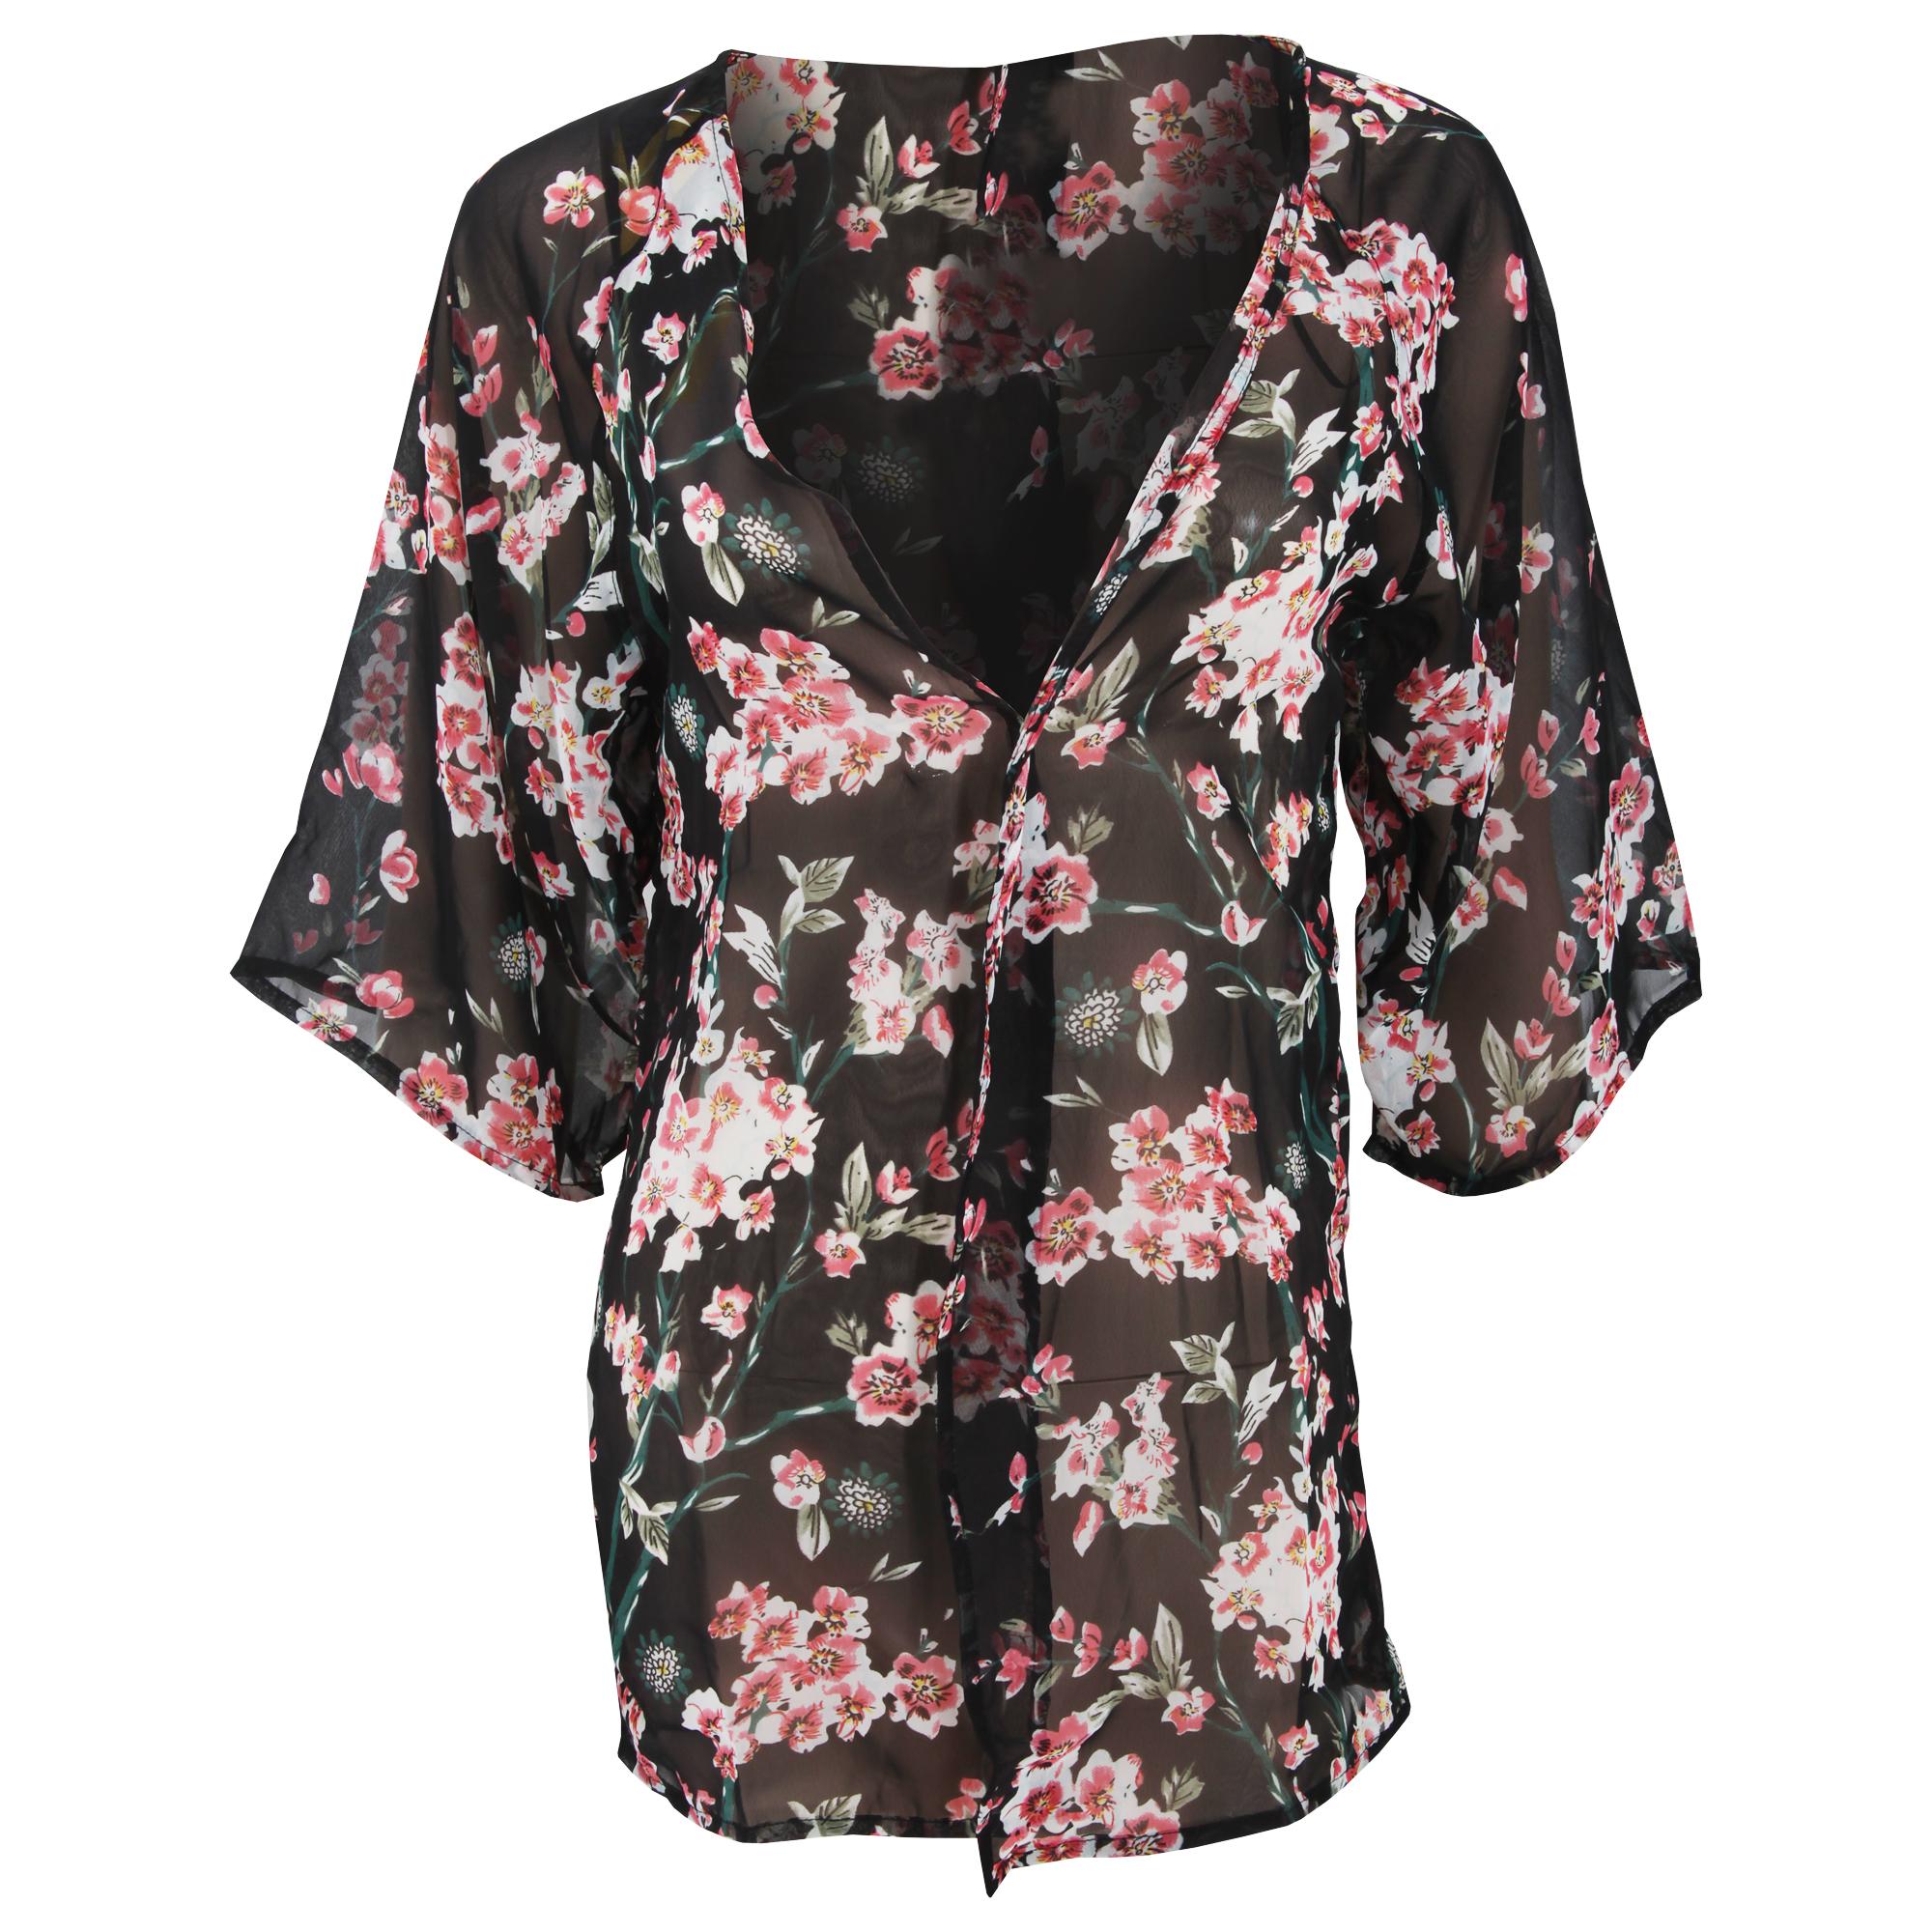 Womens ladies floral chiffon cover up beach shirt ebay for Beach shirt cover up